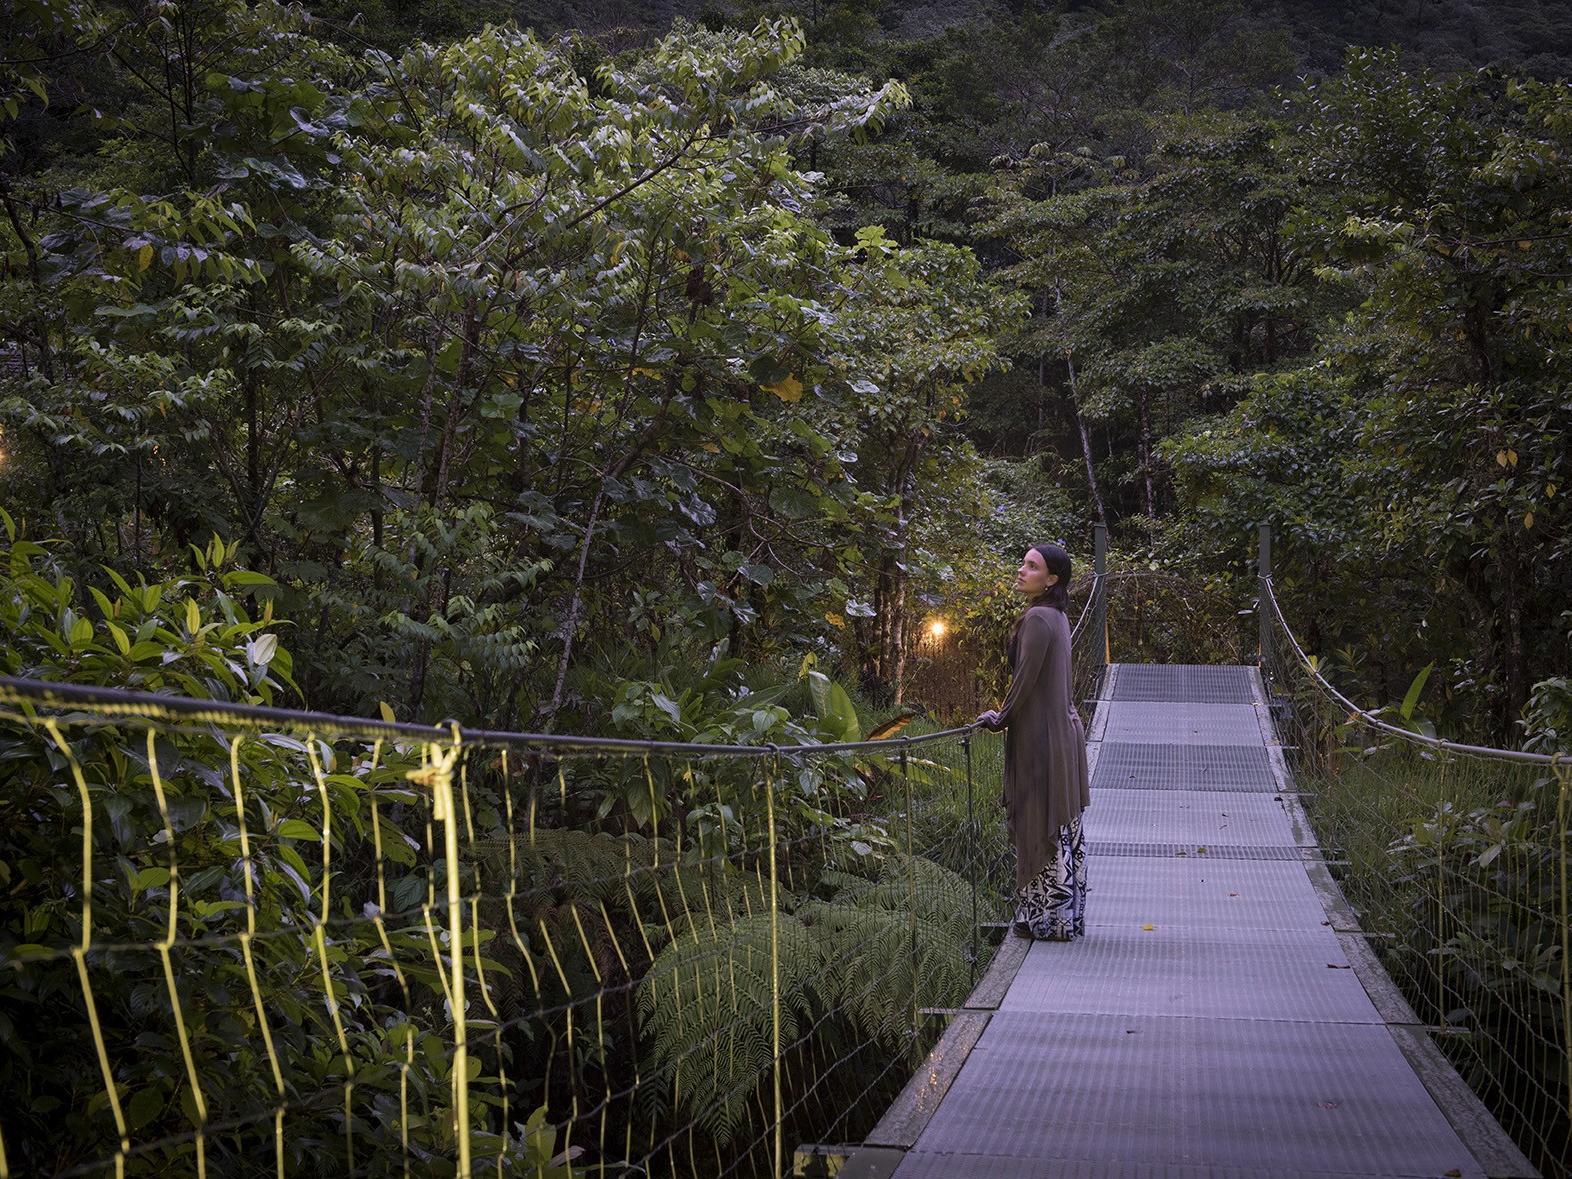 woman standing on bridge gazing at trees